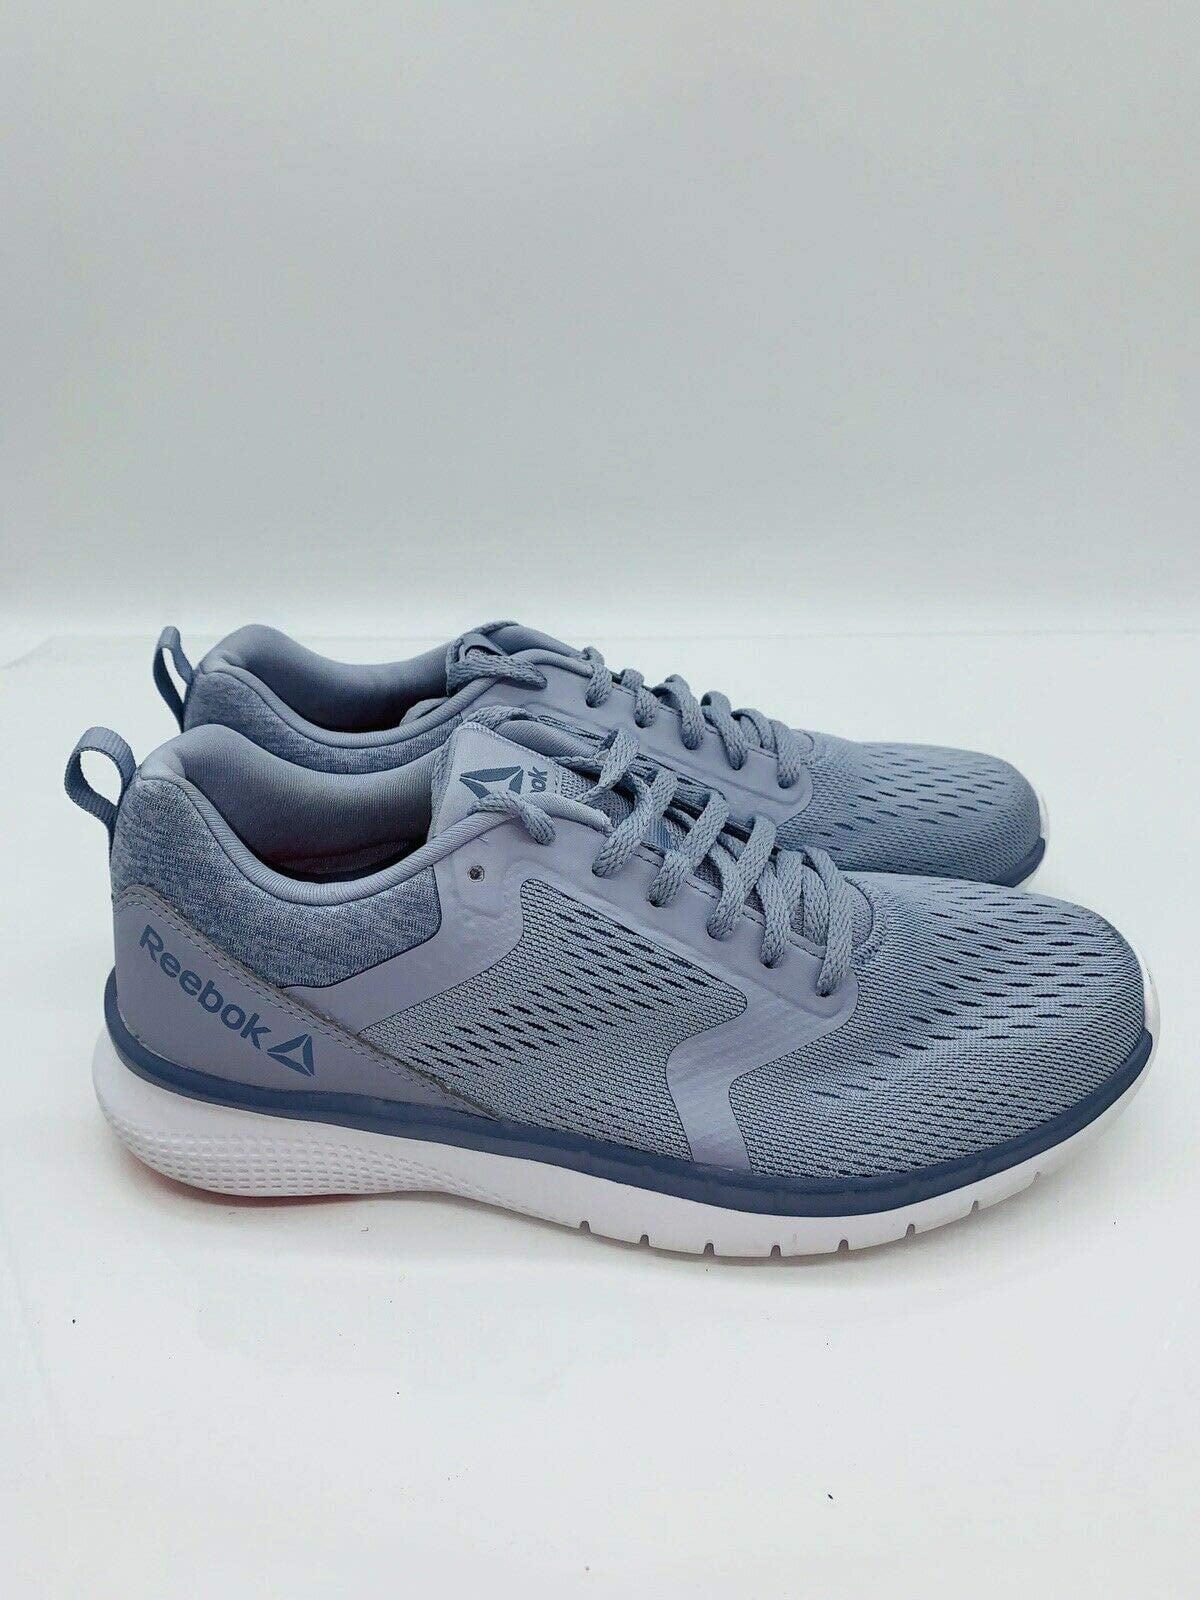 Pt Prime Run 3.0 Shoe